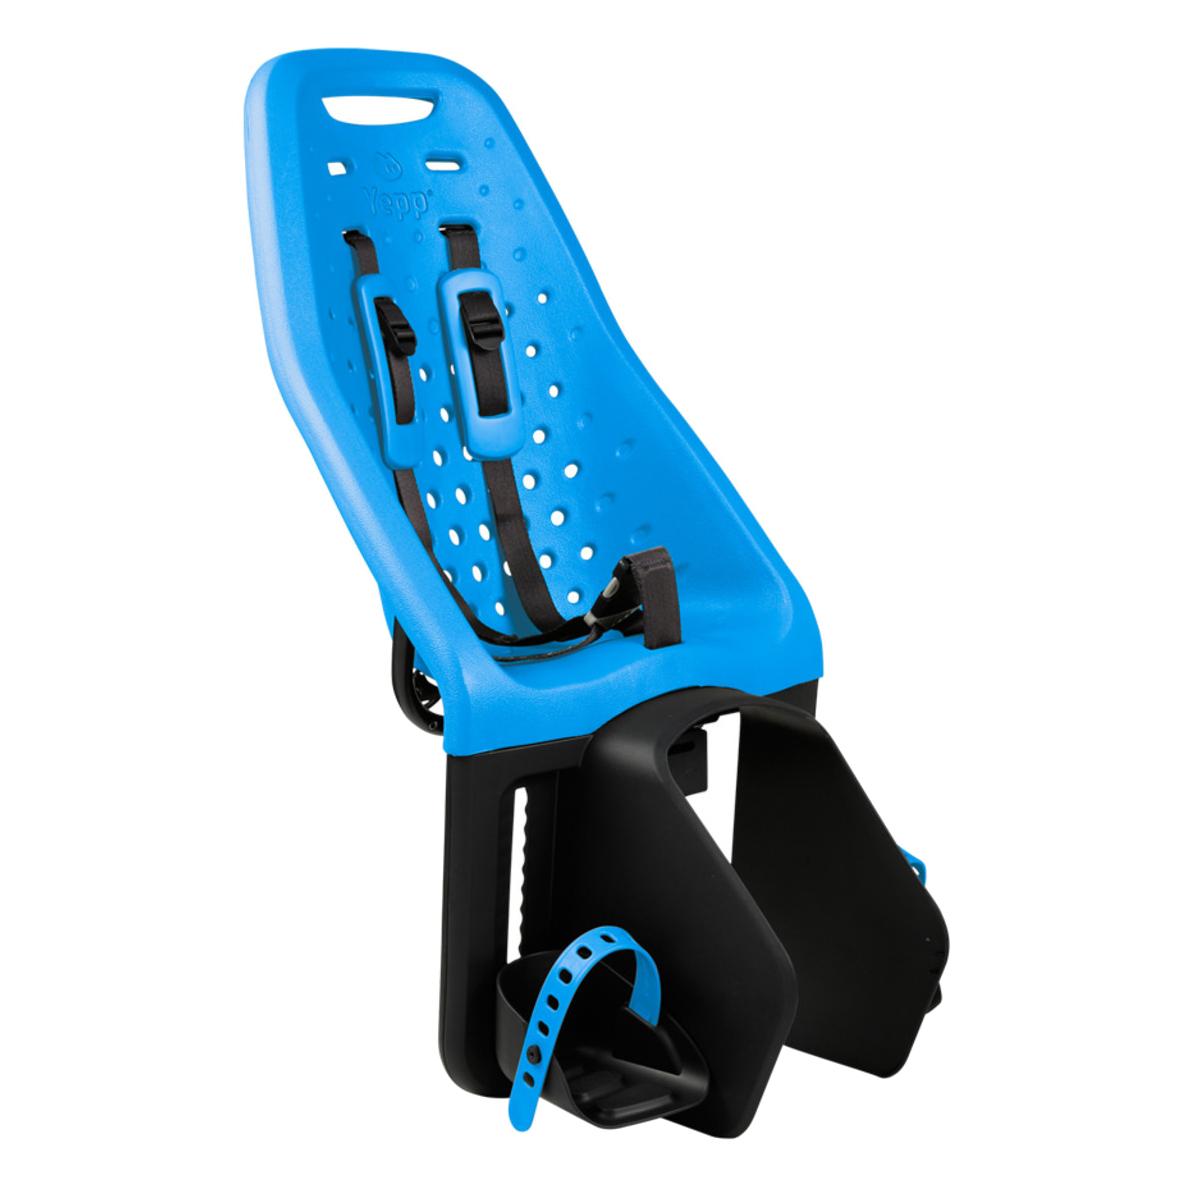 Thule Yepp Maxi rack-mounted bike seat